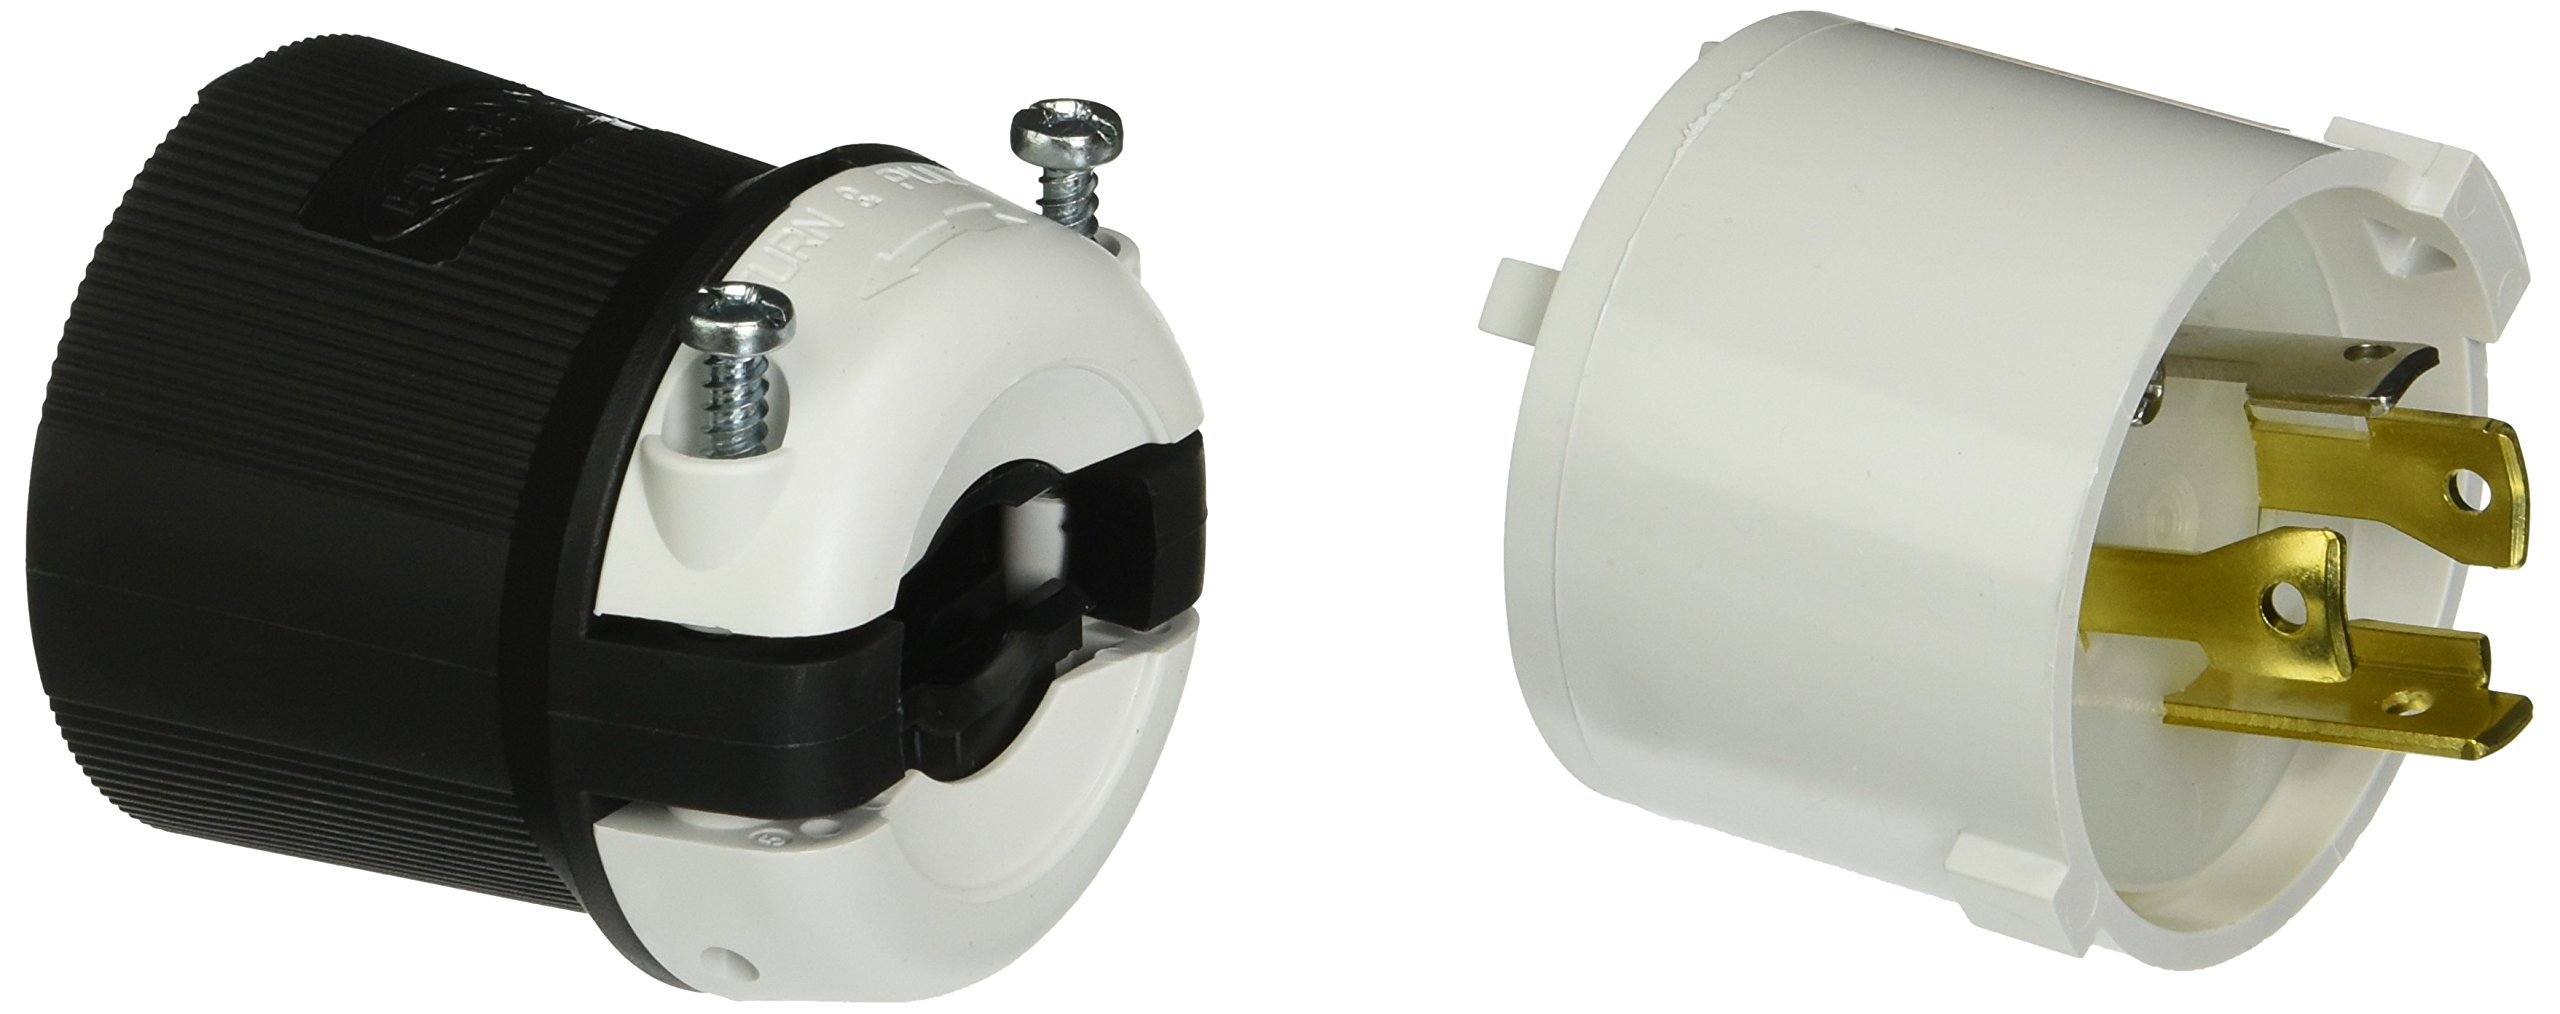 Hubbell HBL2711S Locking Safety Shroud Plug, 30 amp, 125/250V, L14-30P